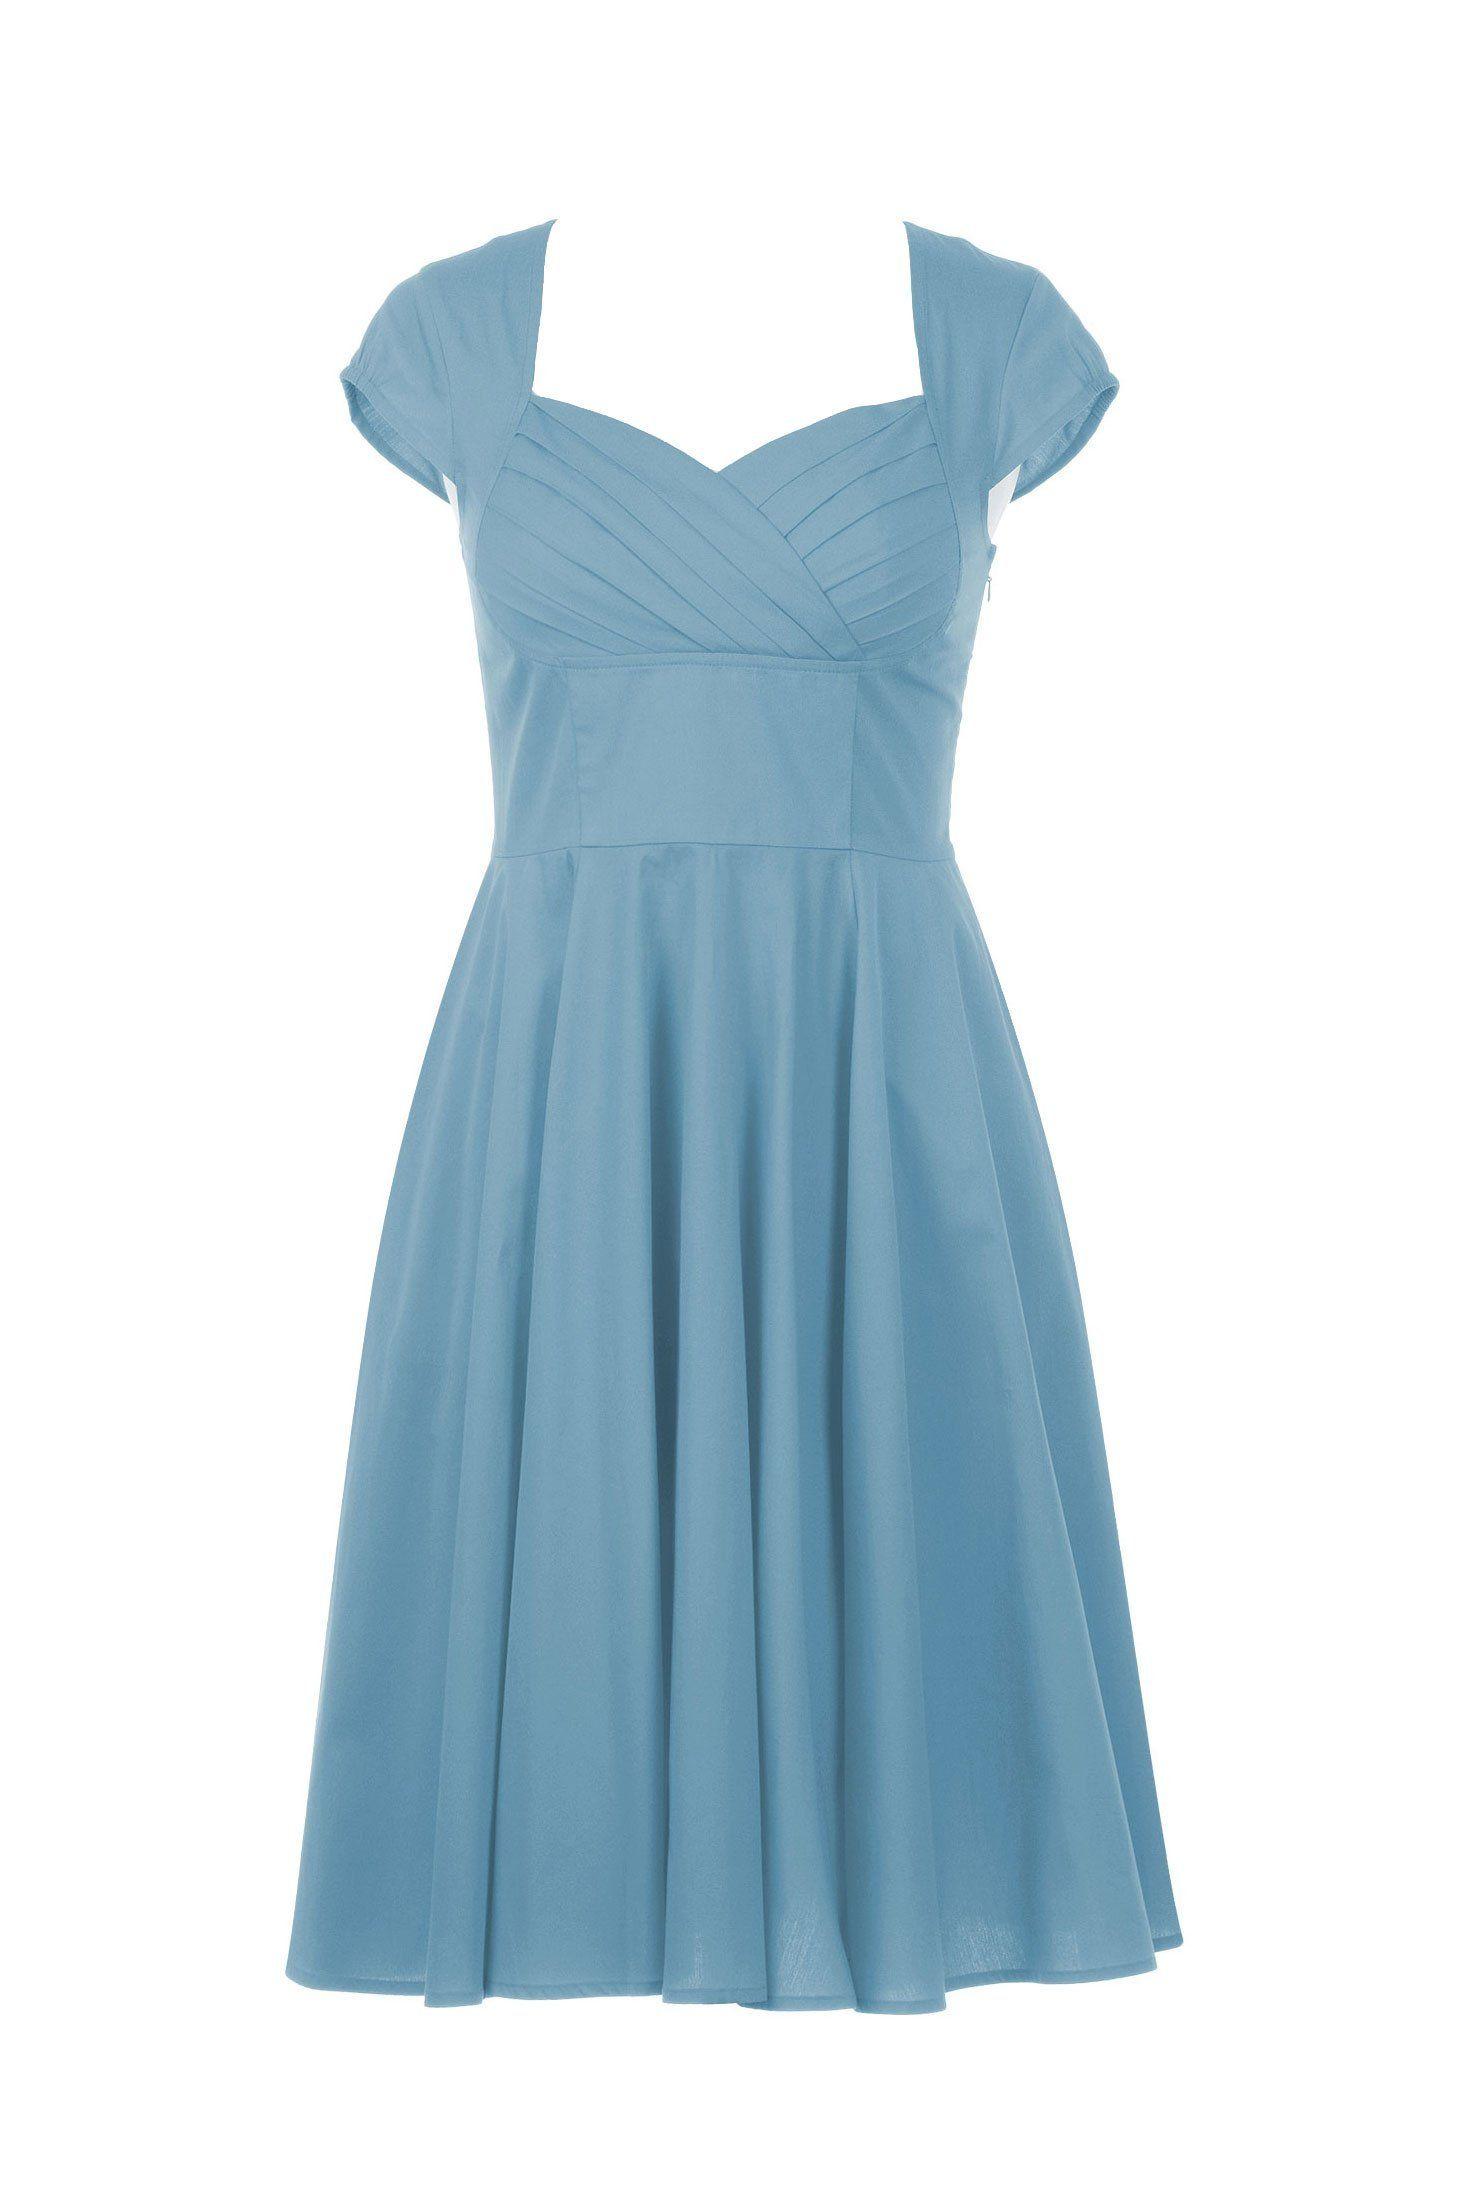 eShakti Women\'s Havana dress M-8 Regular Pale blue   My Style ...